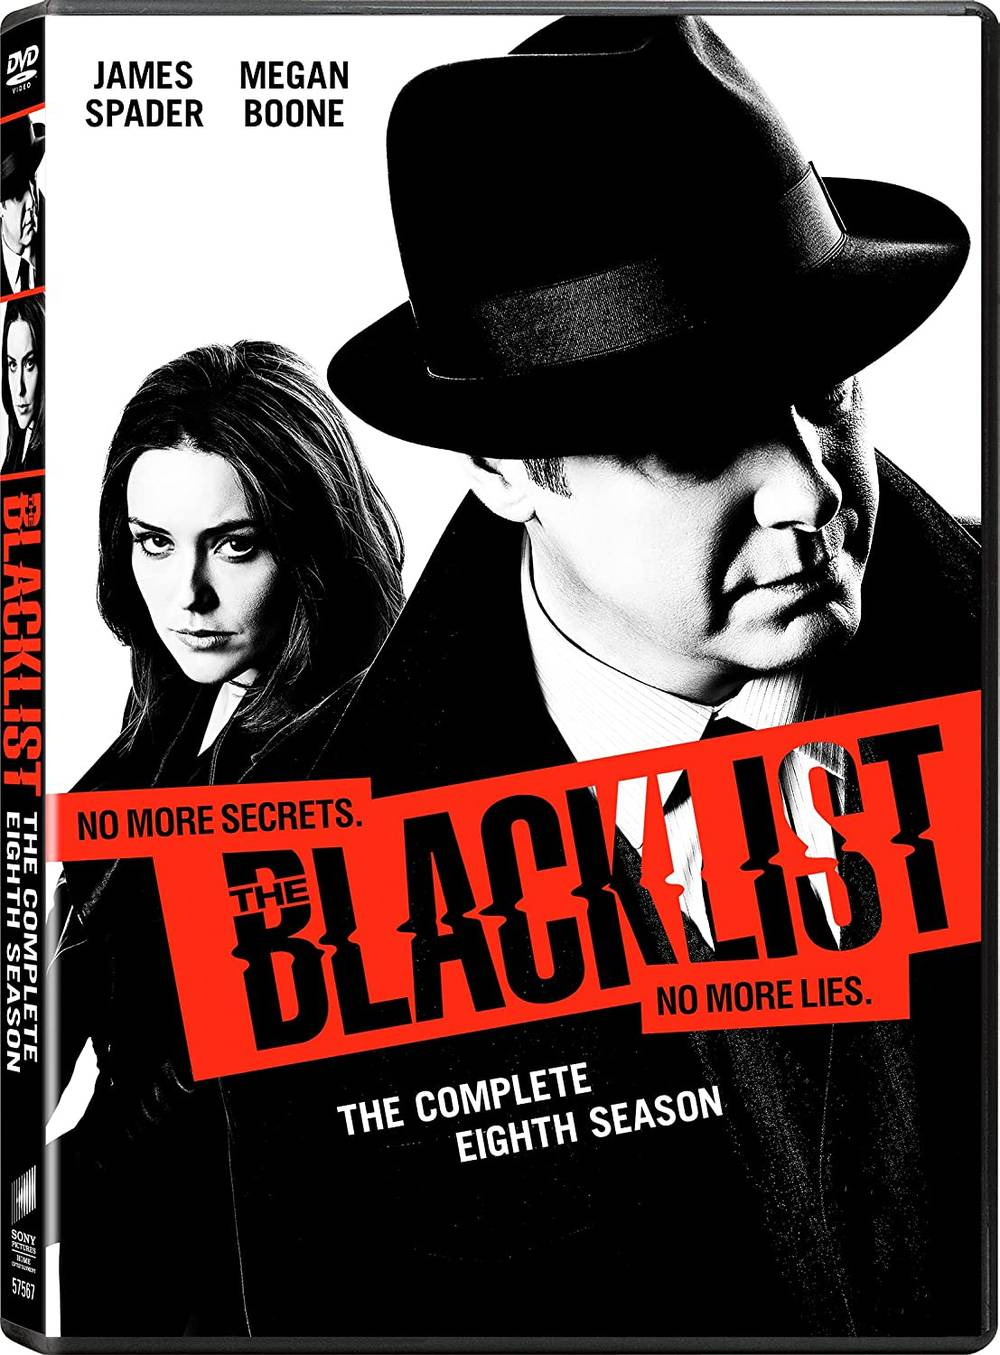 The Blacklist [TV Series] - The Blacklist: The Complete Eighth Season